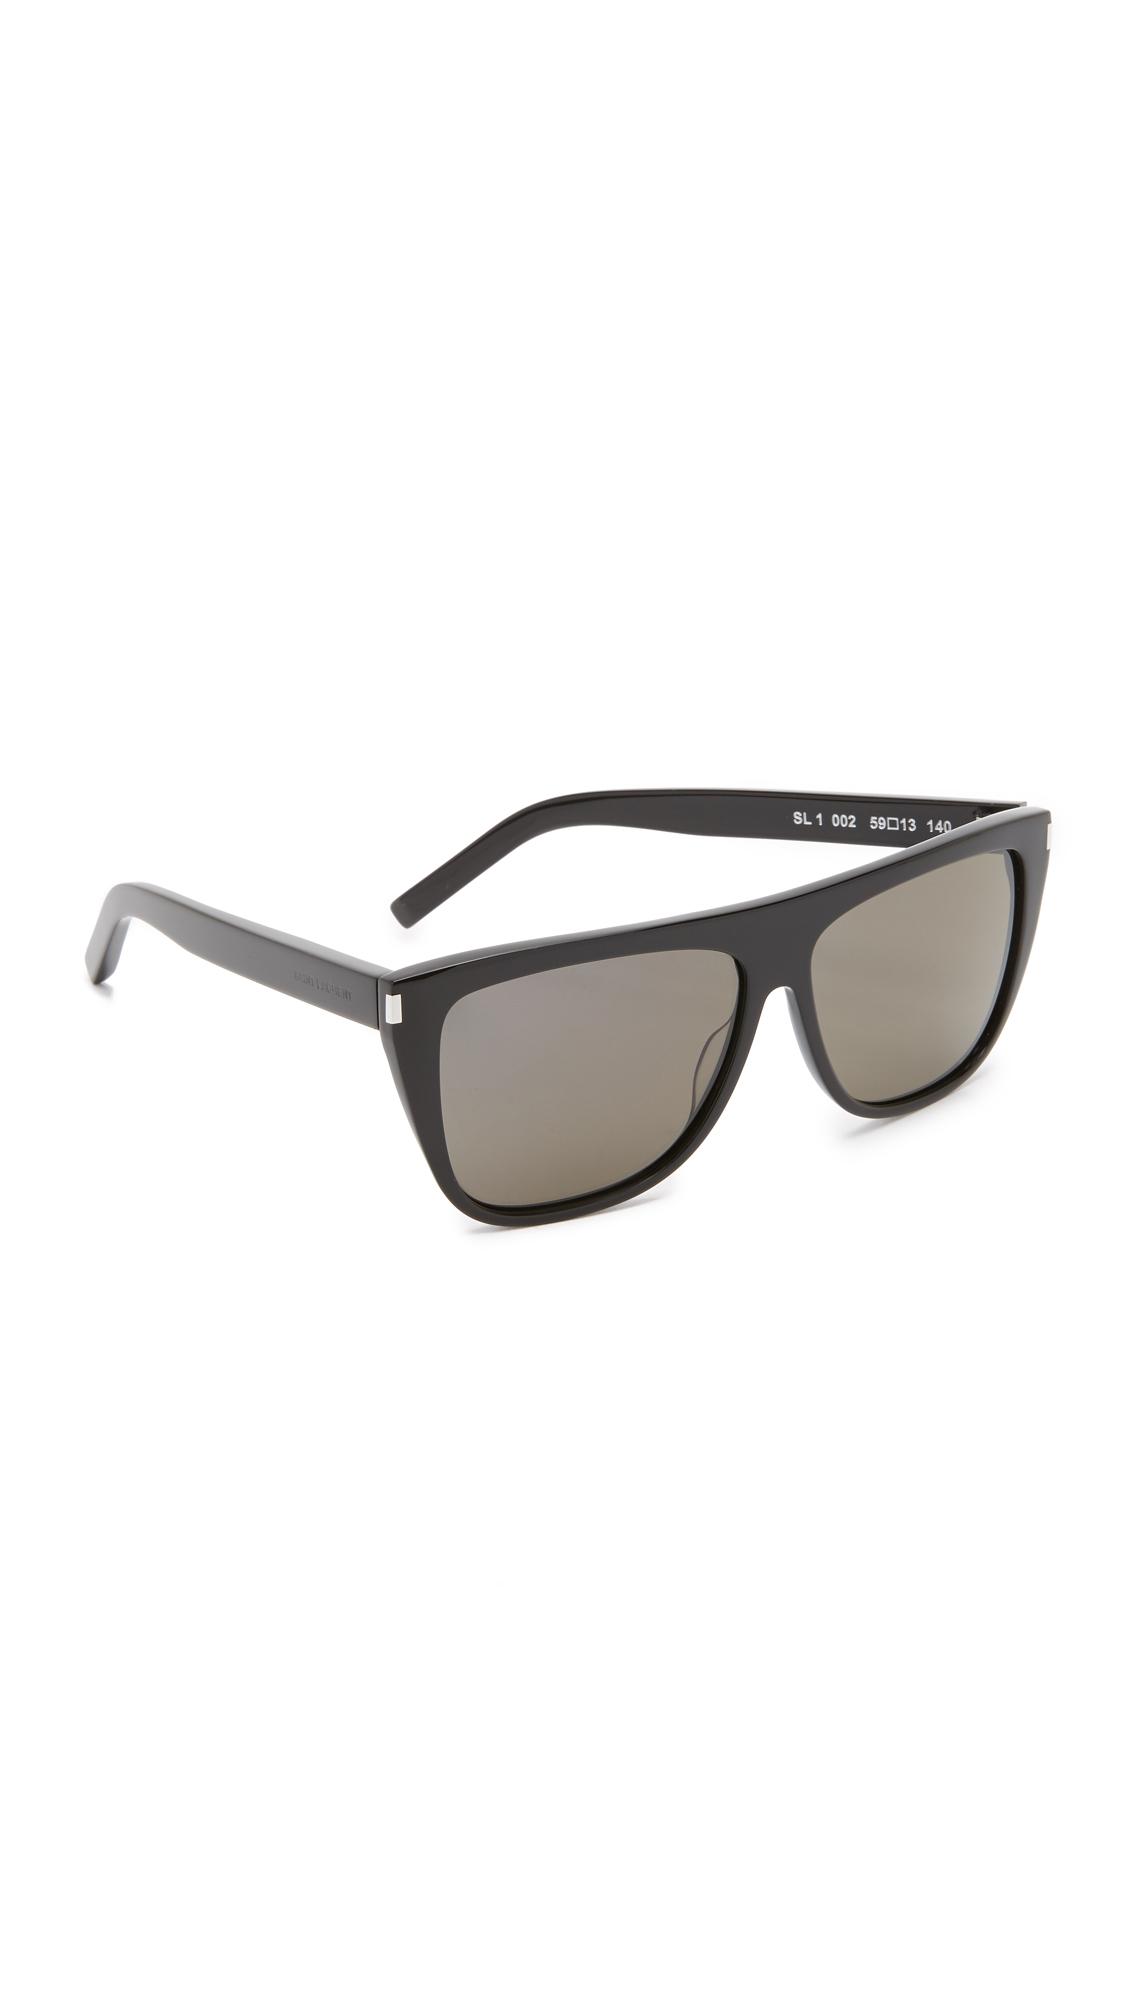 Saint Laurent SL 1 Mineral Glass Sunglasses In Black/Smoke